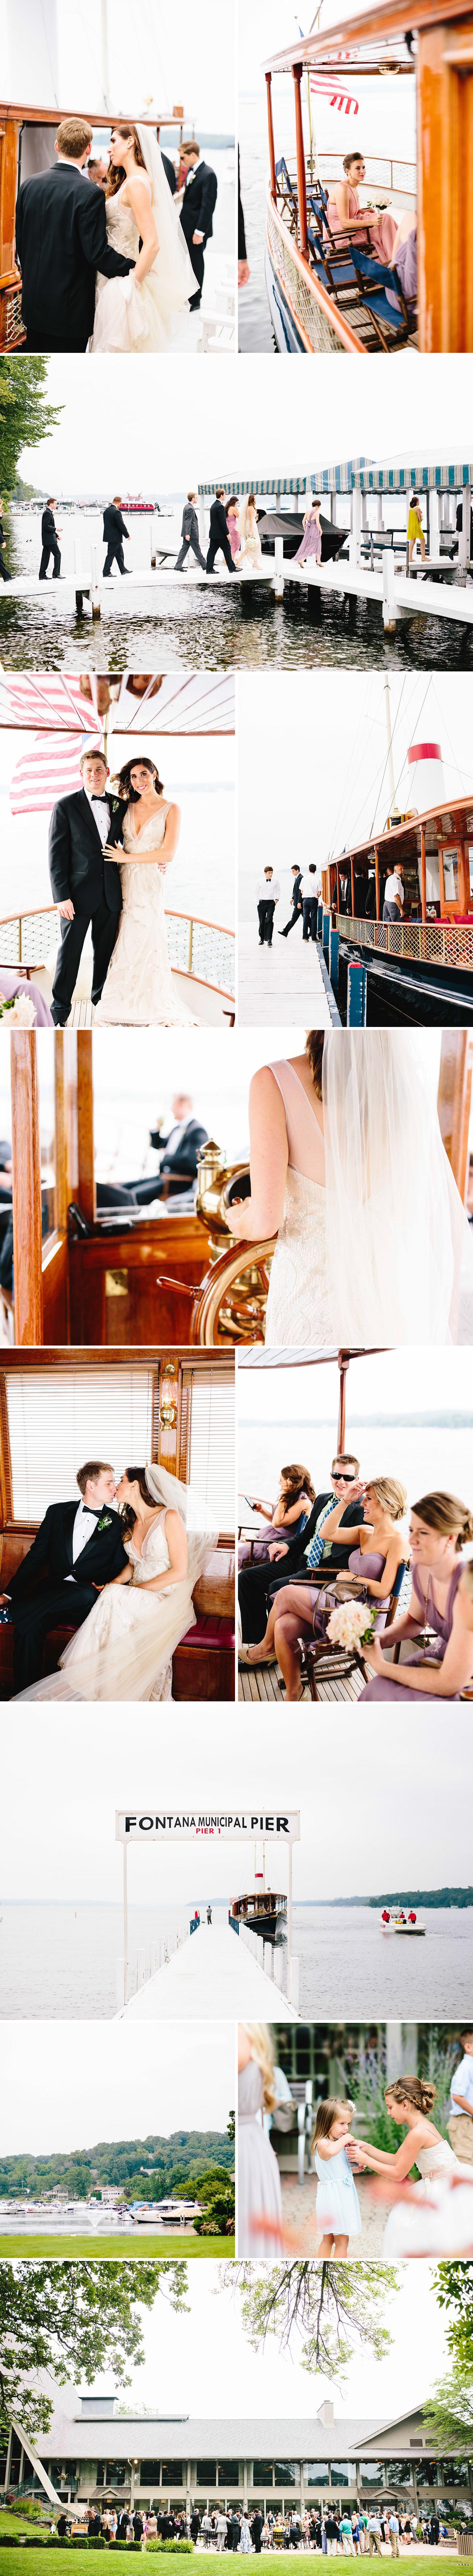 chicago-fine-art-wedding-photography-owens4